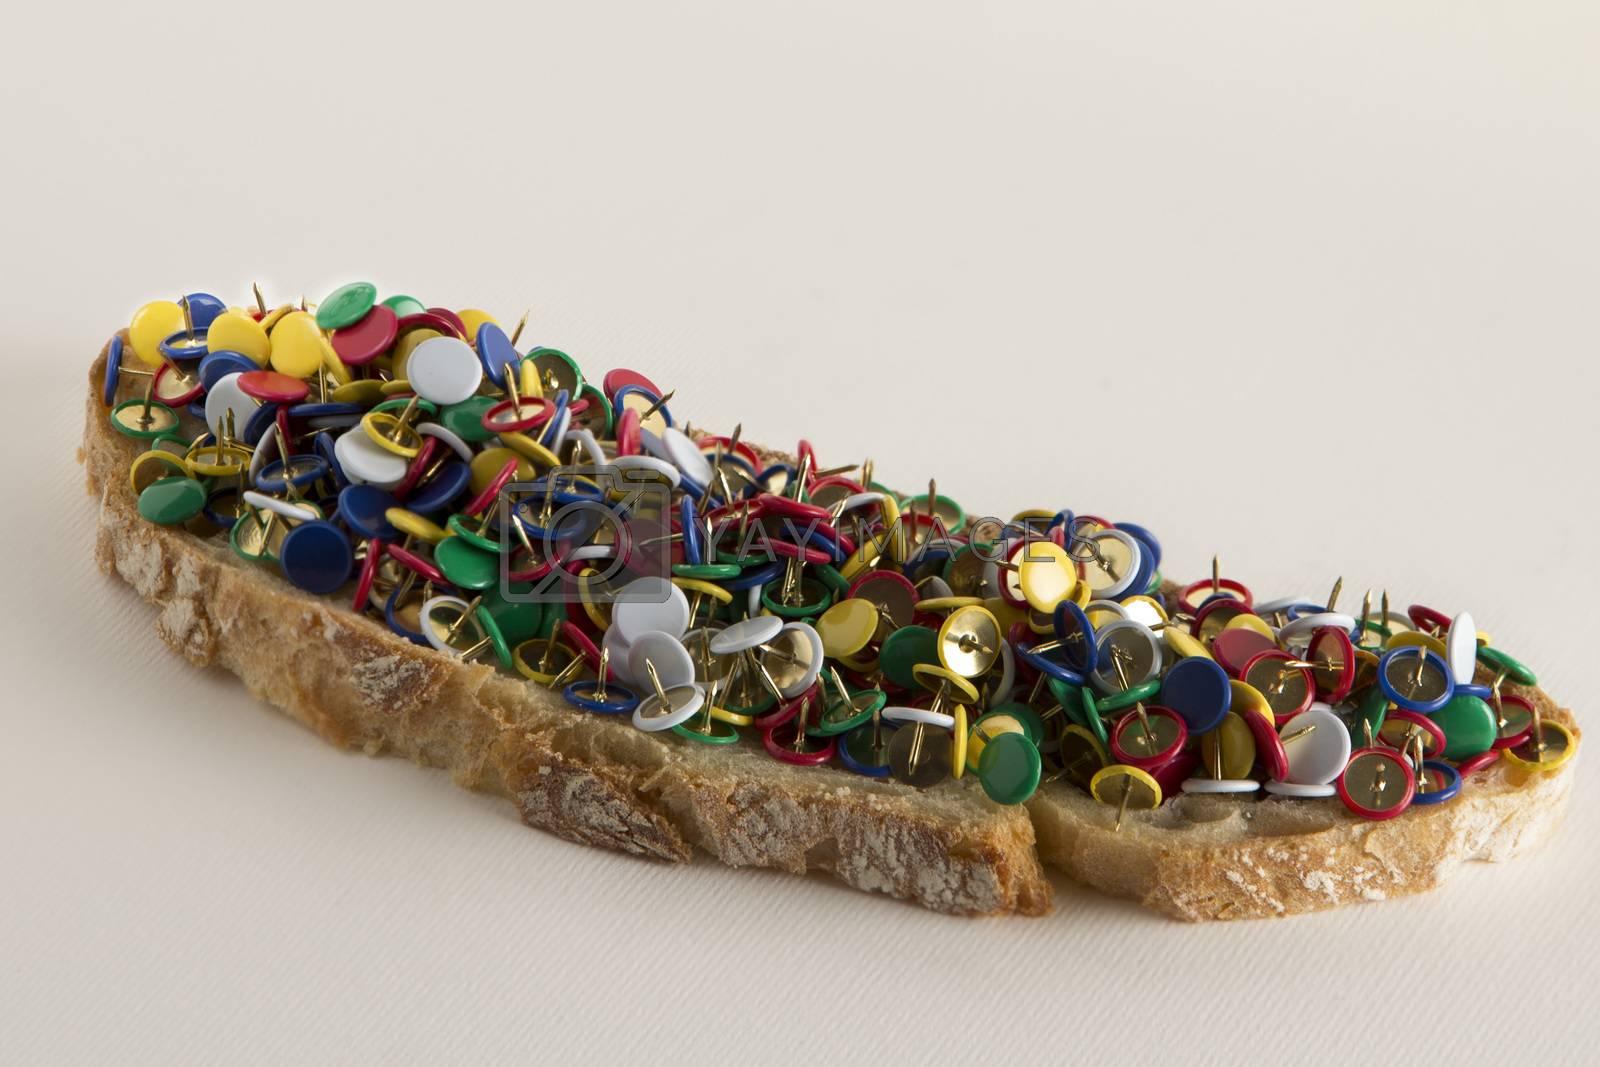 Italian bread and pins